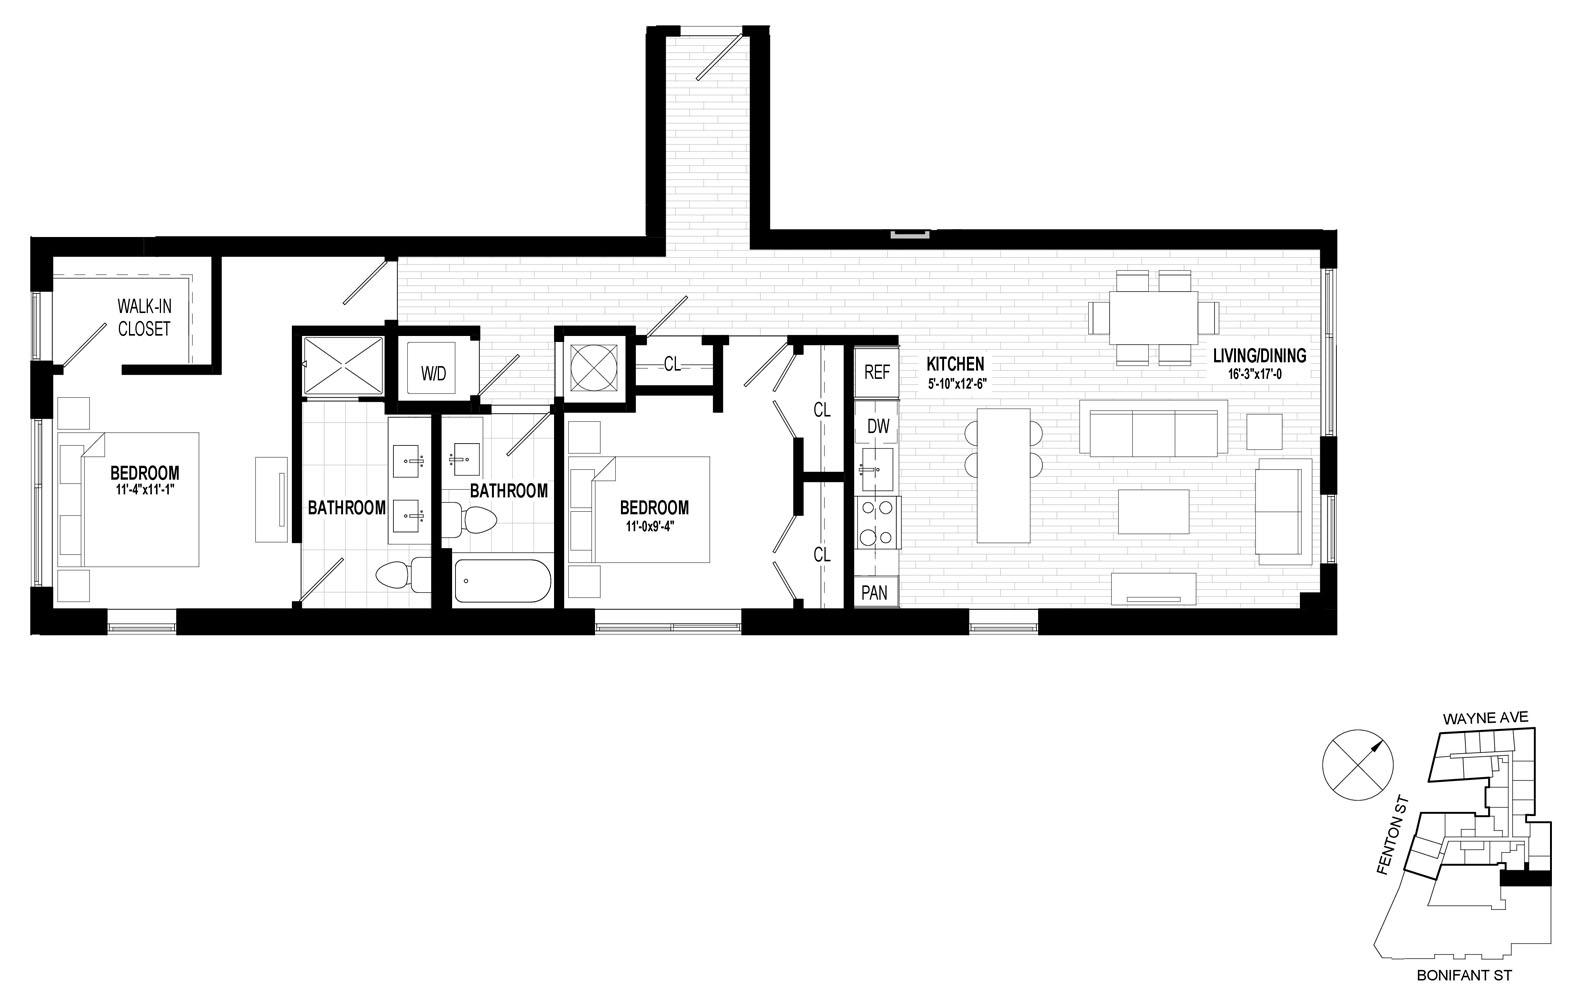 P0578887 761bc12 central c09 1140 2 floorplan